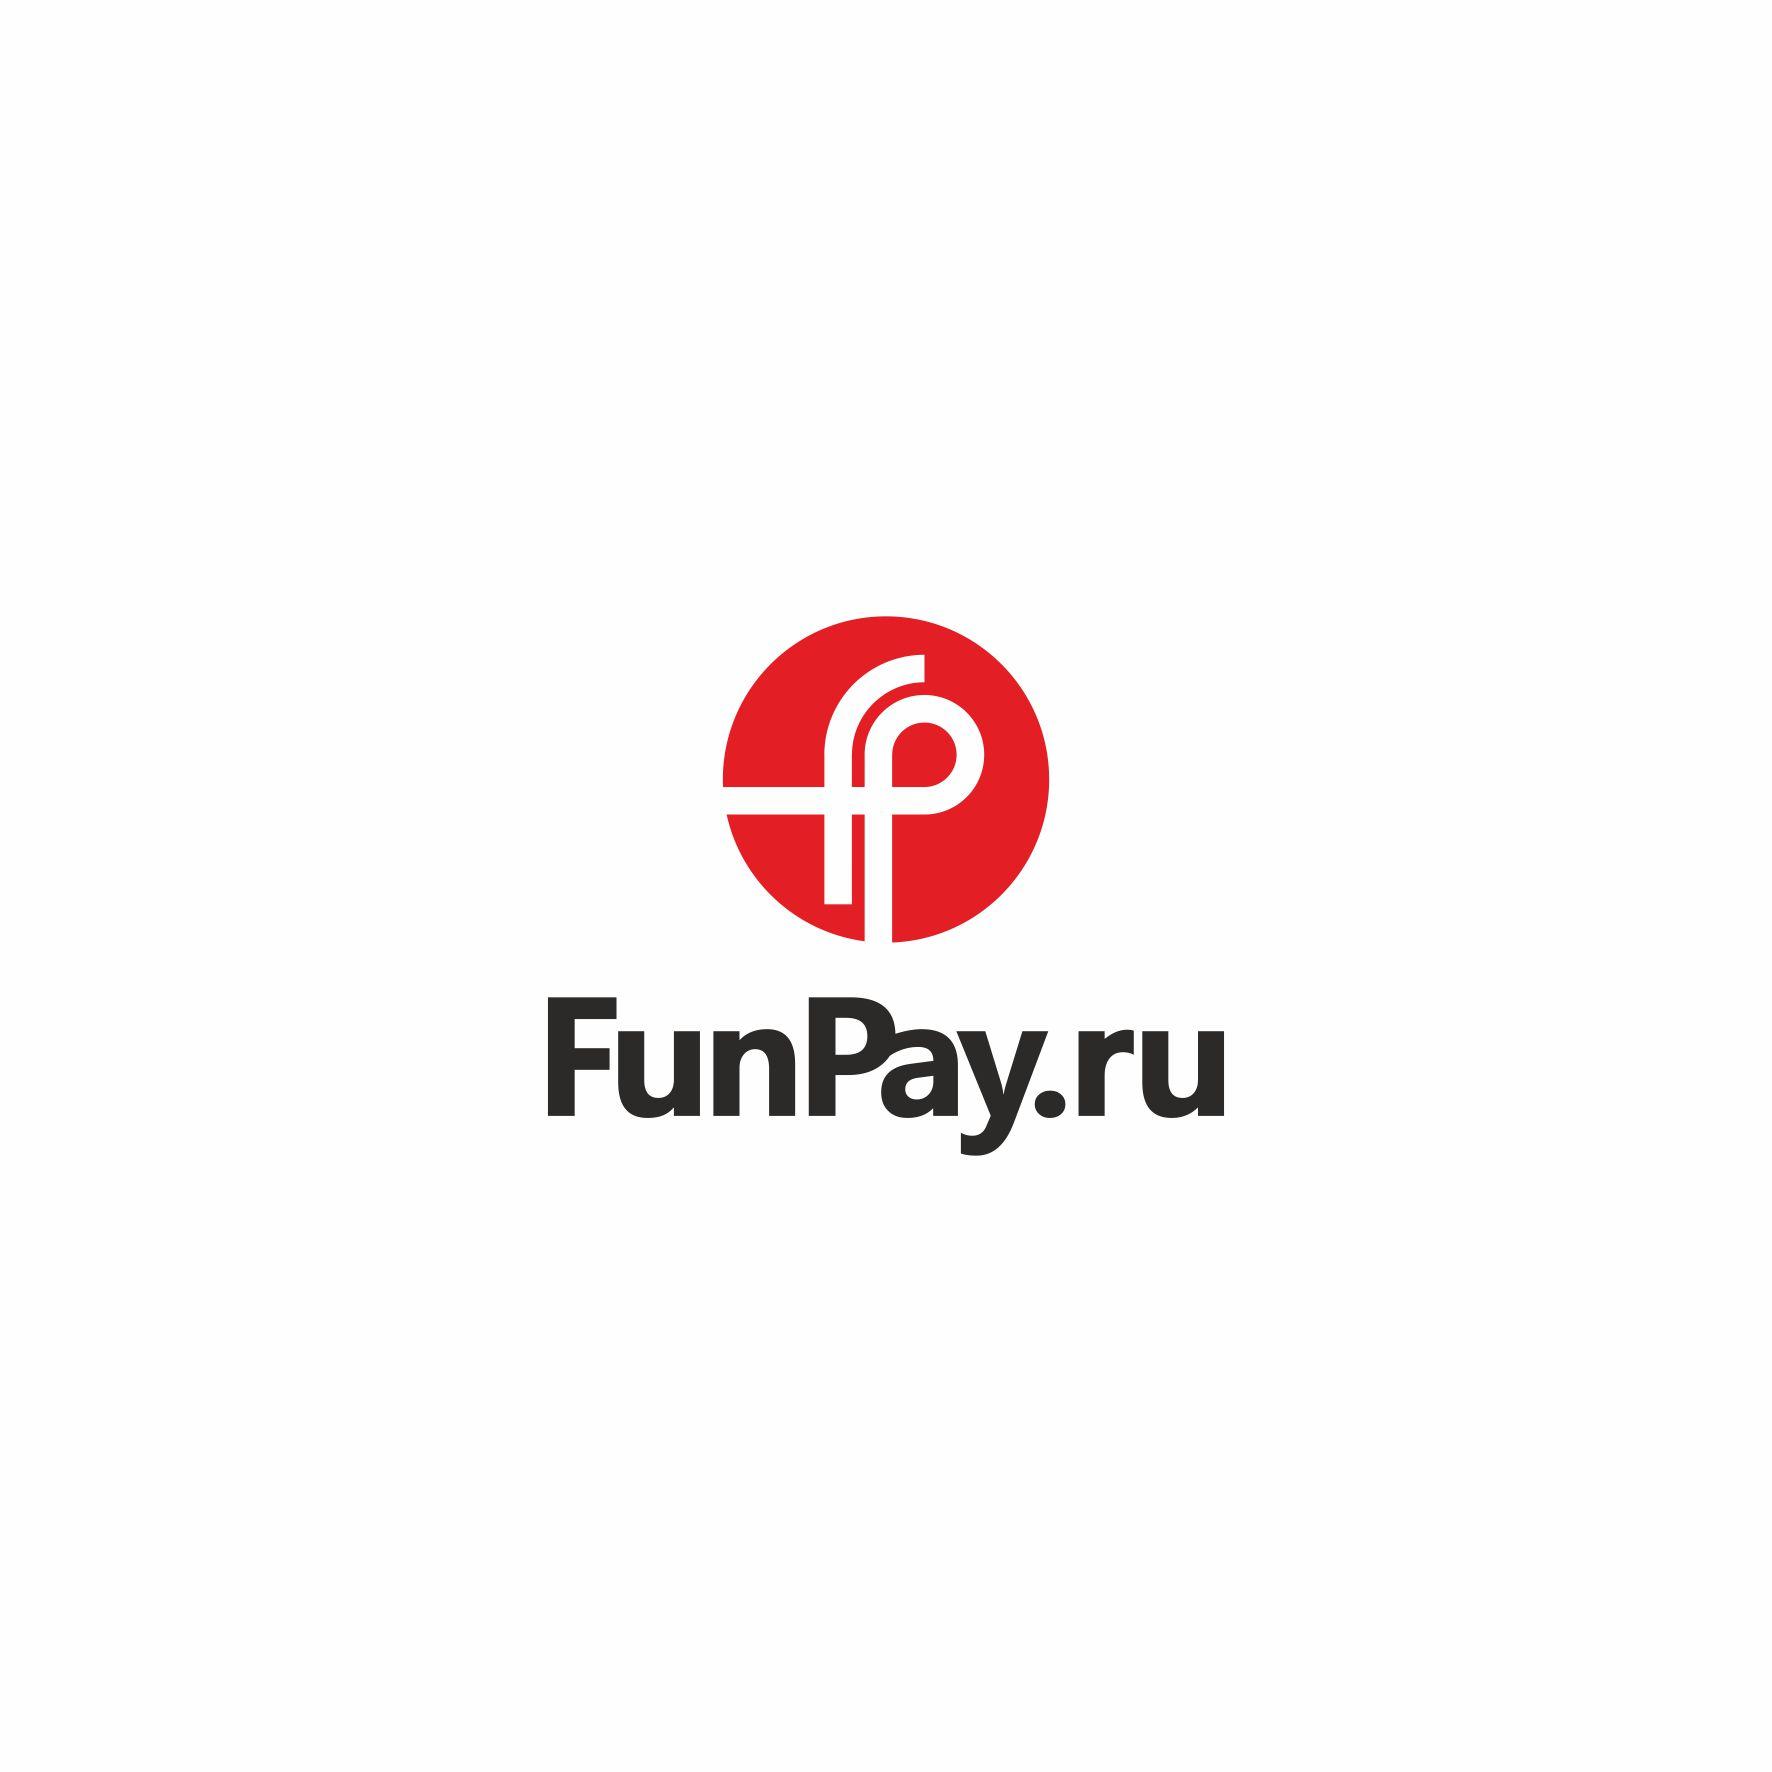 Логотип для FunPay.ru фото f_6635991ef9d6c162.jpg